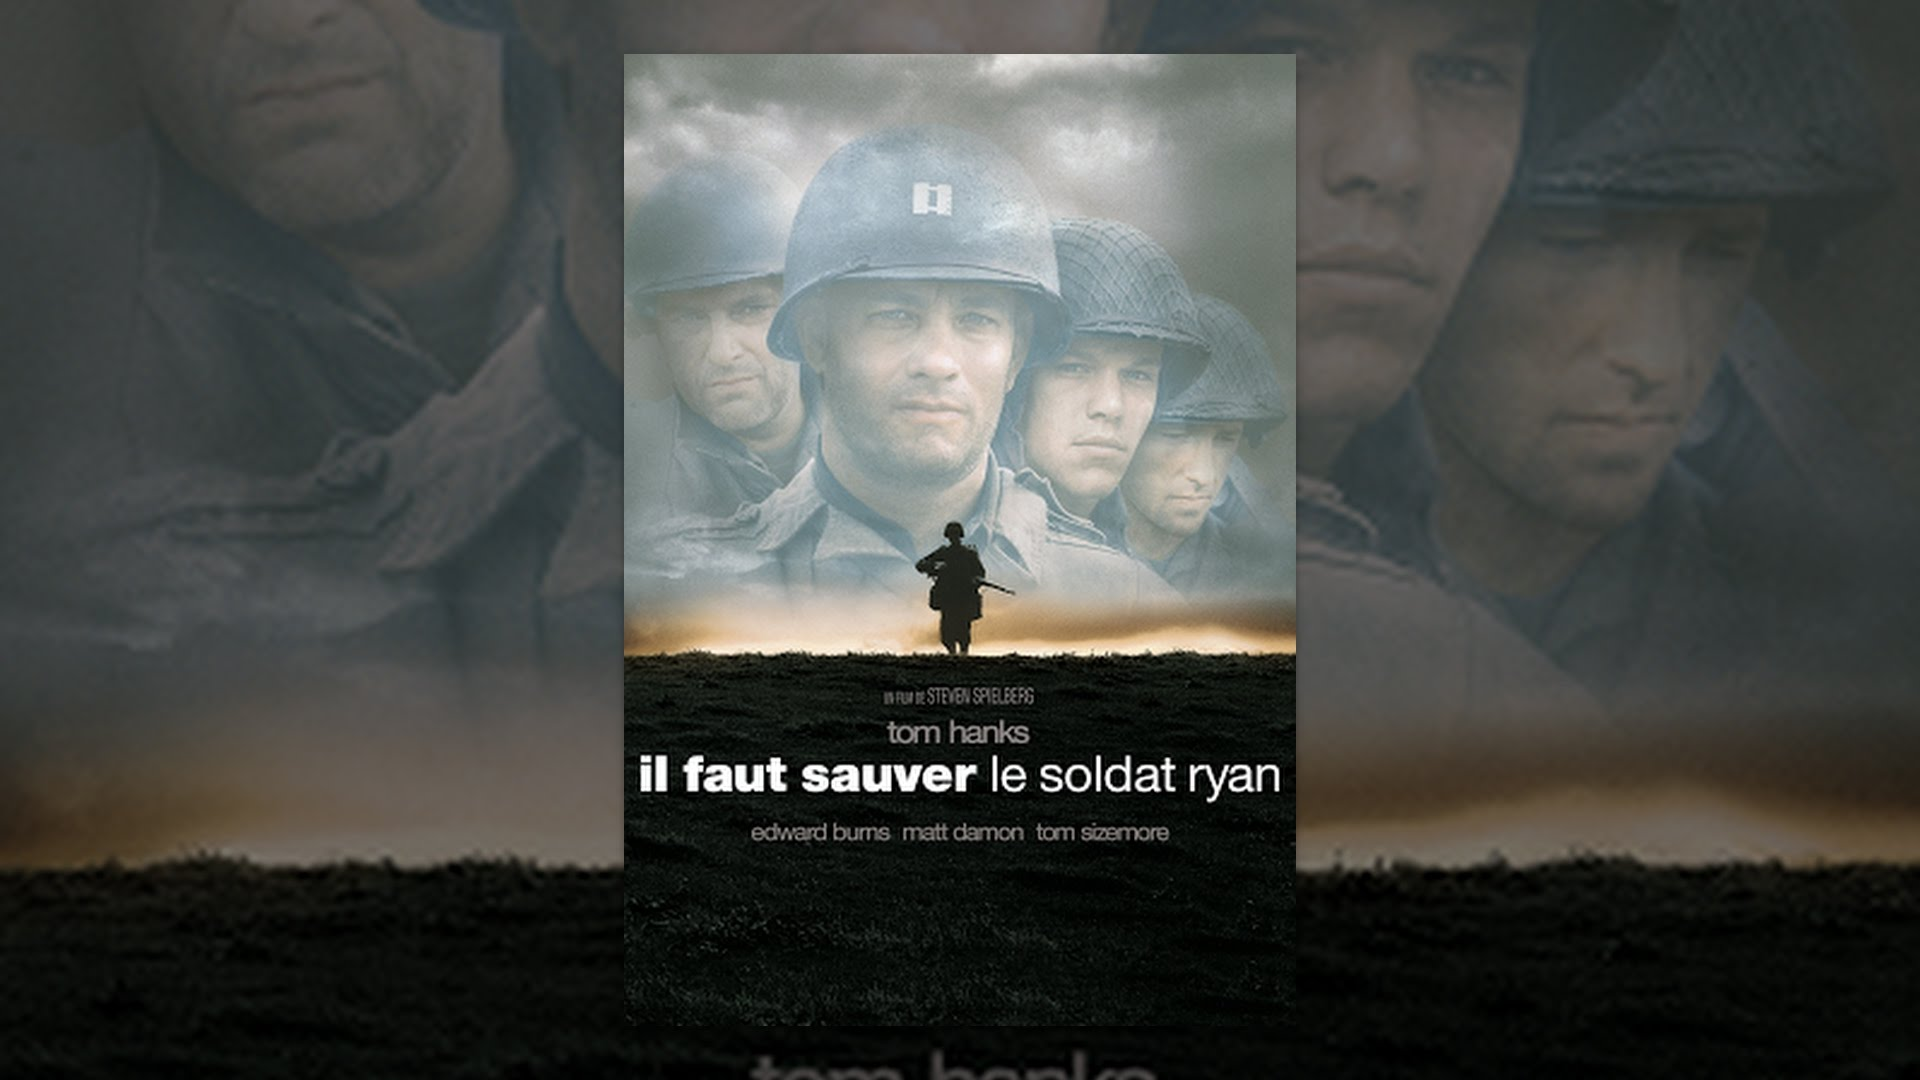 il faut sauver le soldat ryan vf youtube. Black Bedroom Furniture Sets. Home Design Ideas